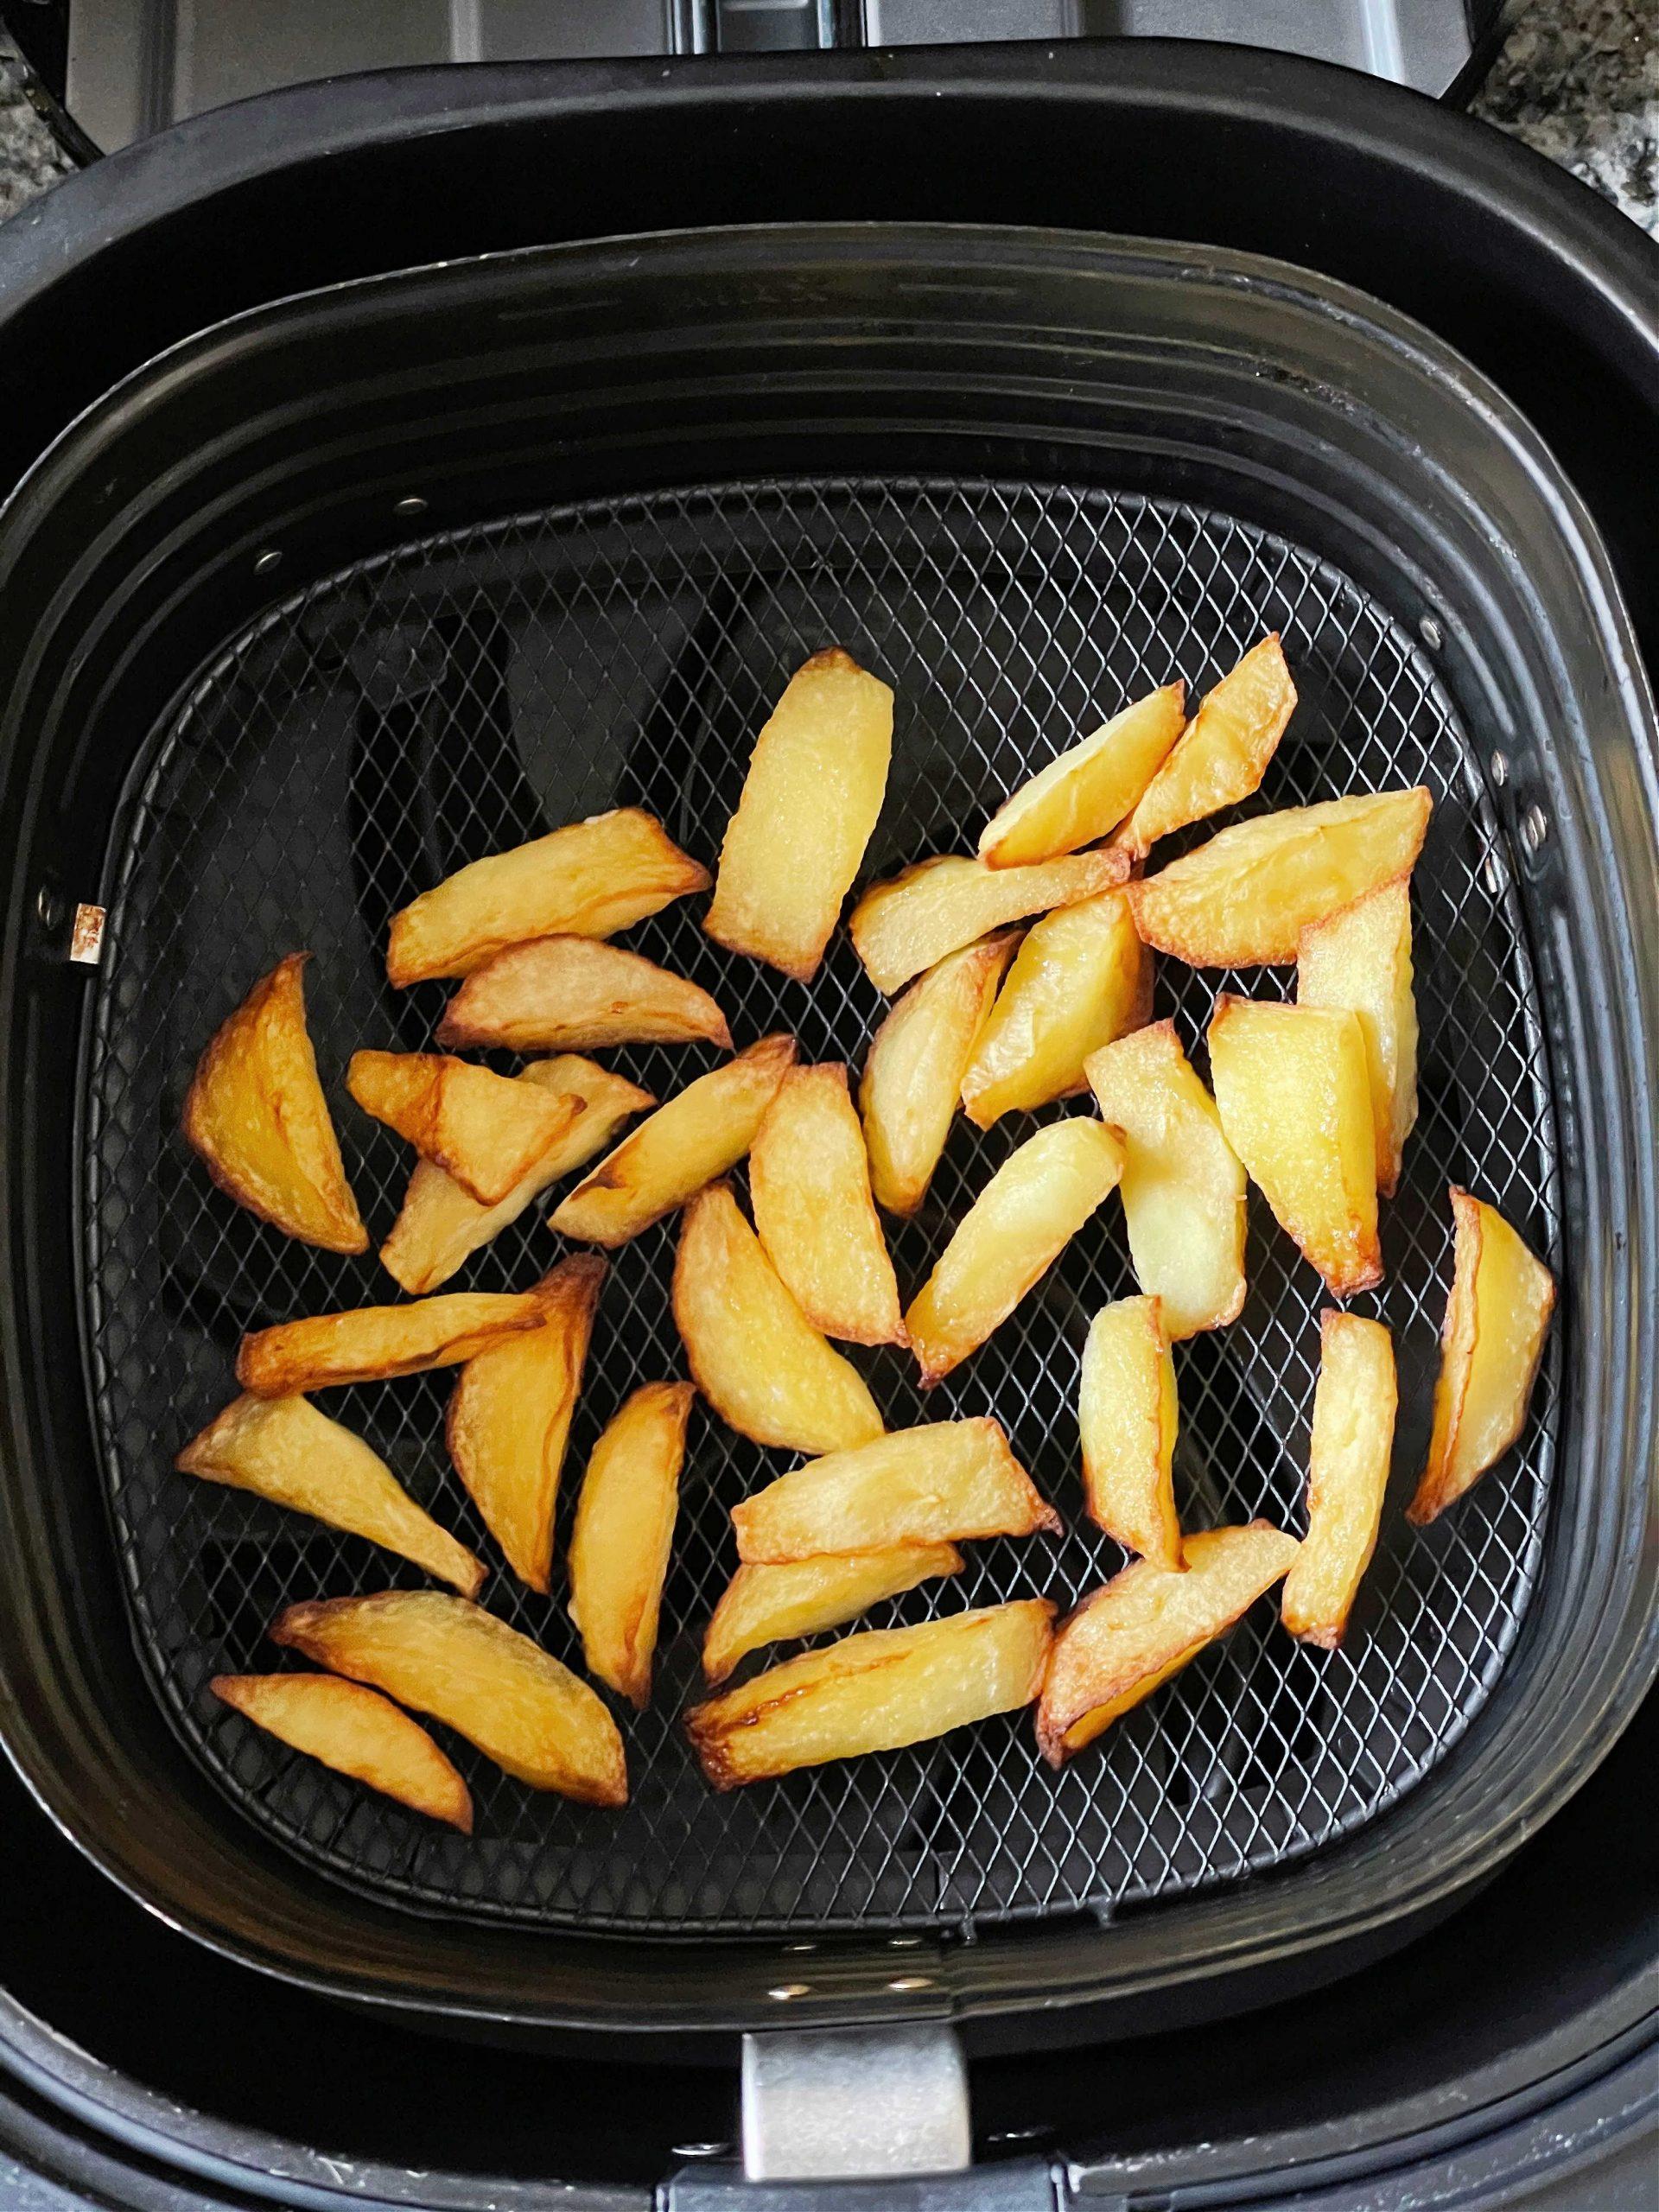 apple slices in the air fryer basket